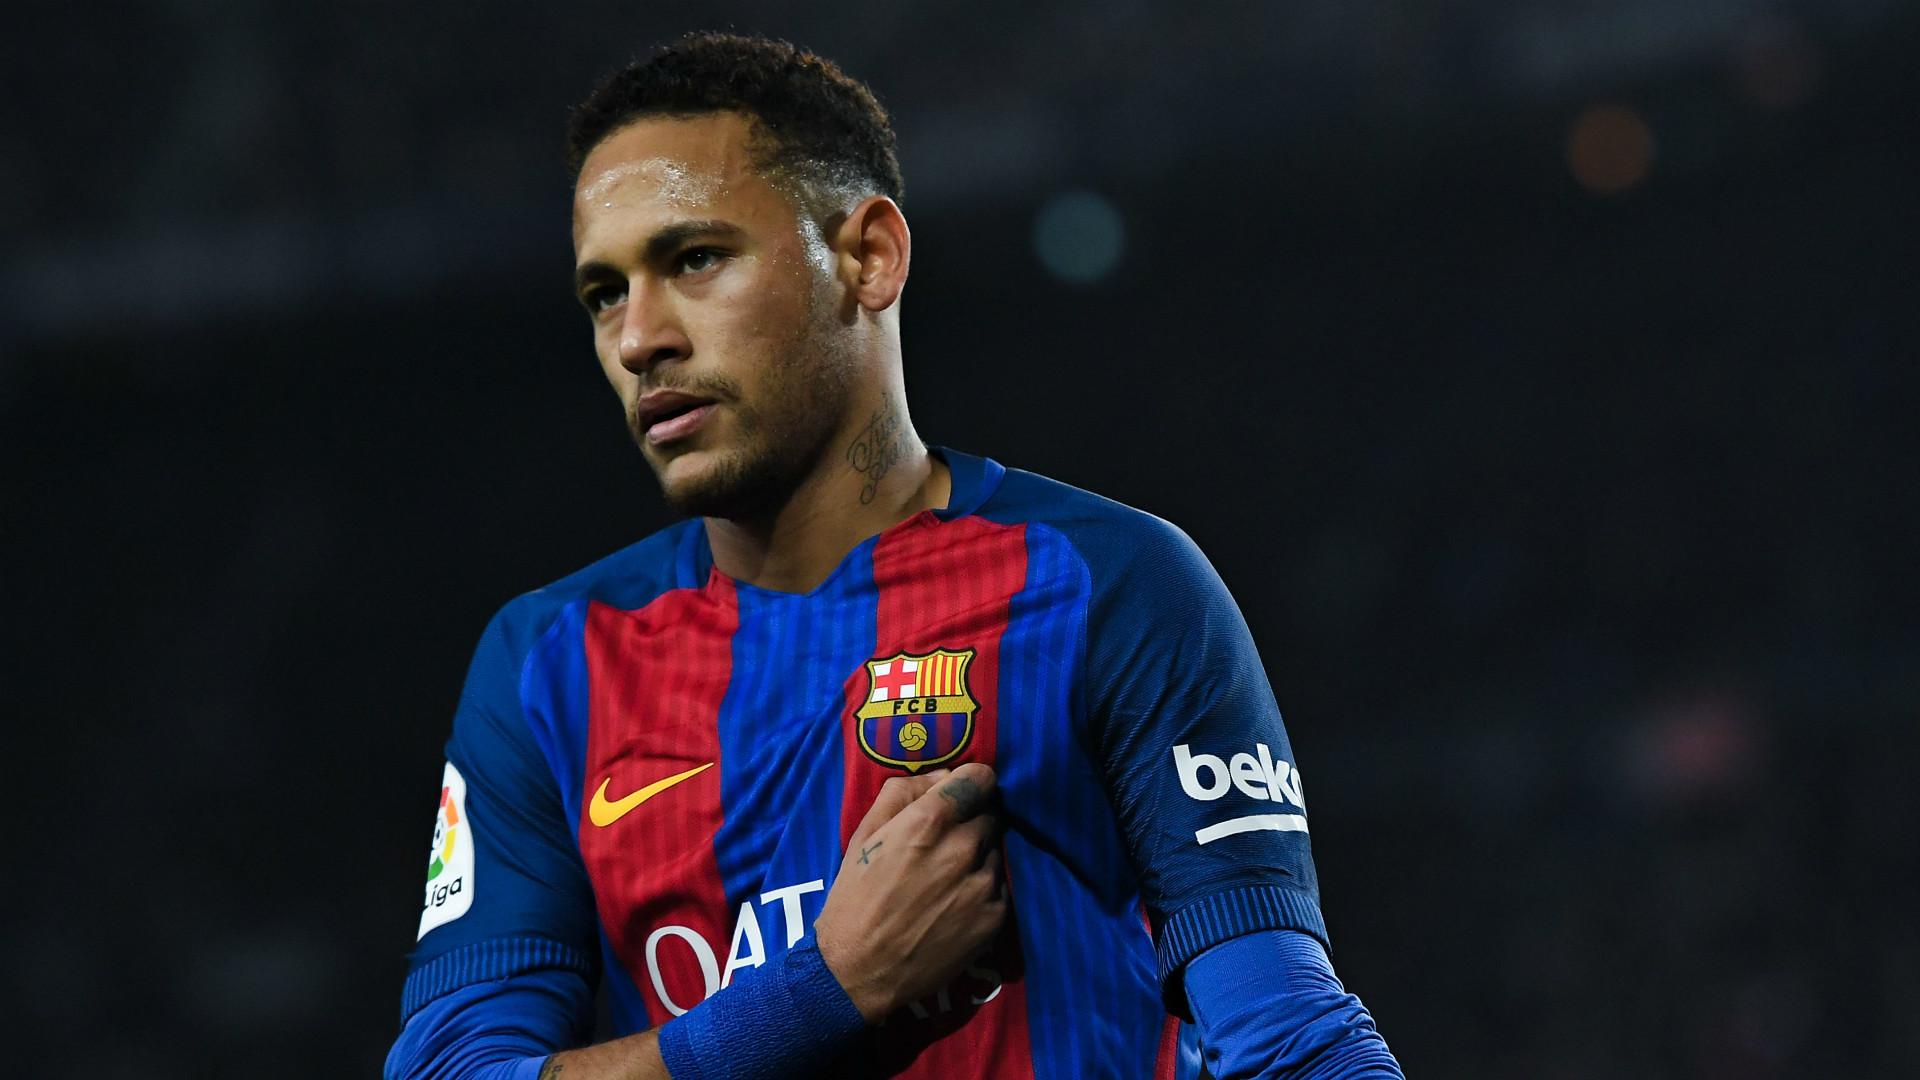 73.4 – Messi 94.6 – Aubameyang 104.3 – RONALDO 126.7 – Suarez 179.8 –  Griezmann 297.3 – Neymar